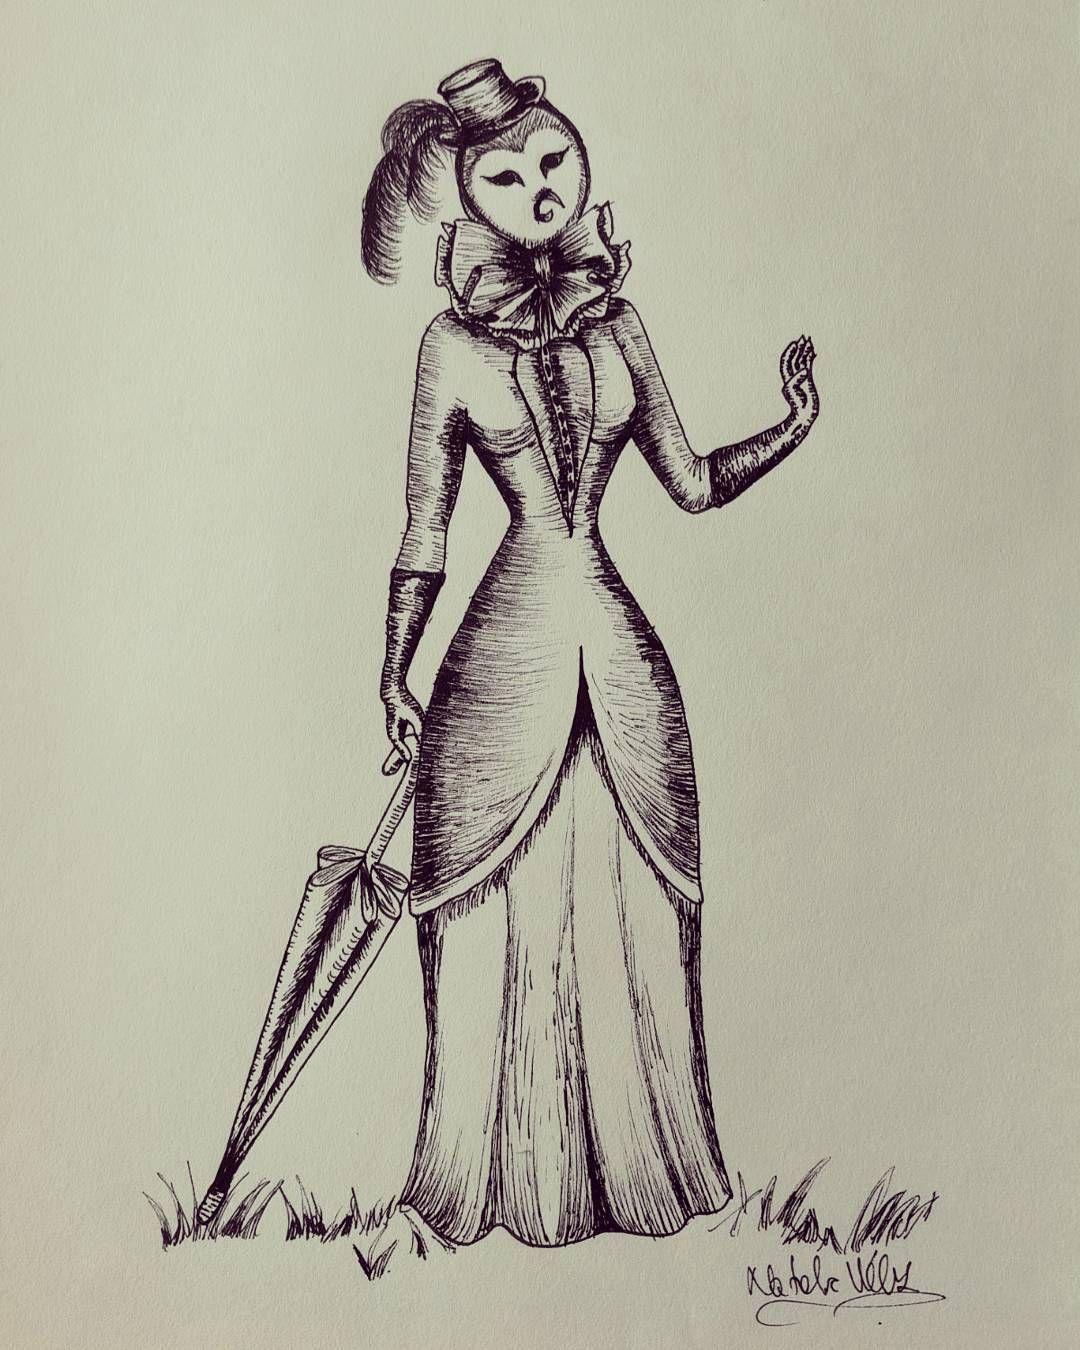 La Senorita Buho By Natalia Velez Ink Illustration Ilustracion Owl Lady Drawing Dibujo Tinta Buho Senorita Art Humanoid Sketch Hare